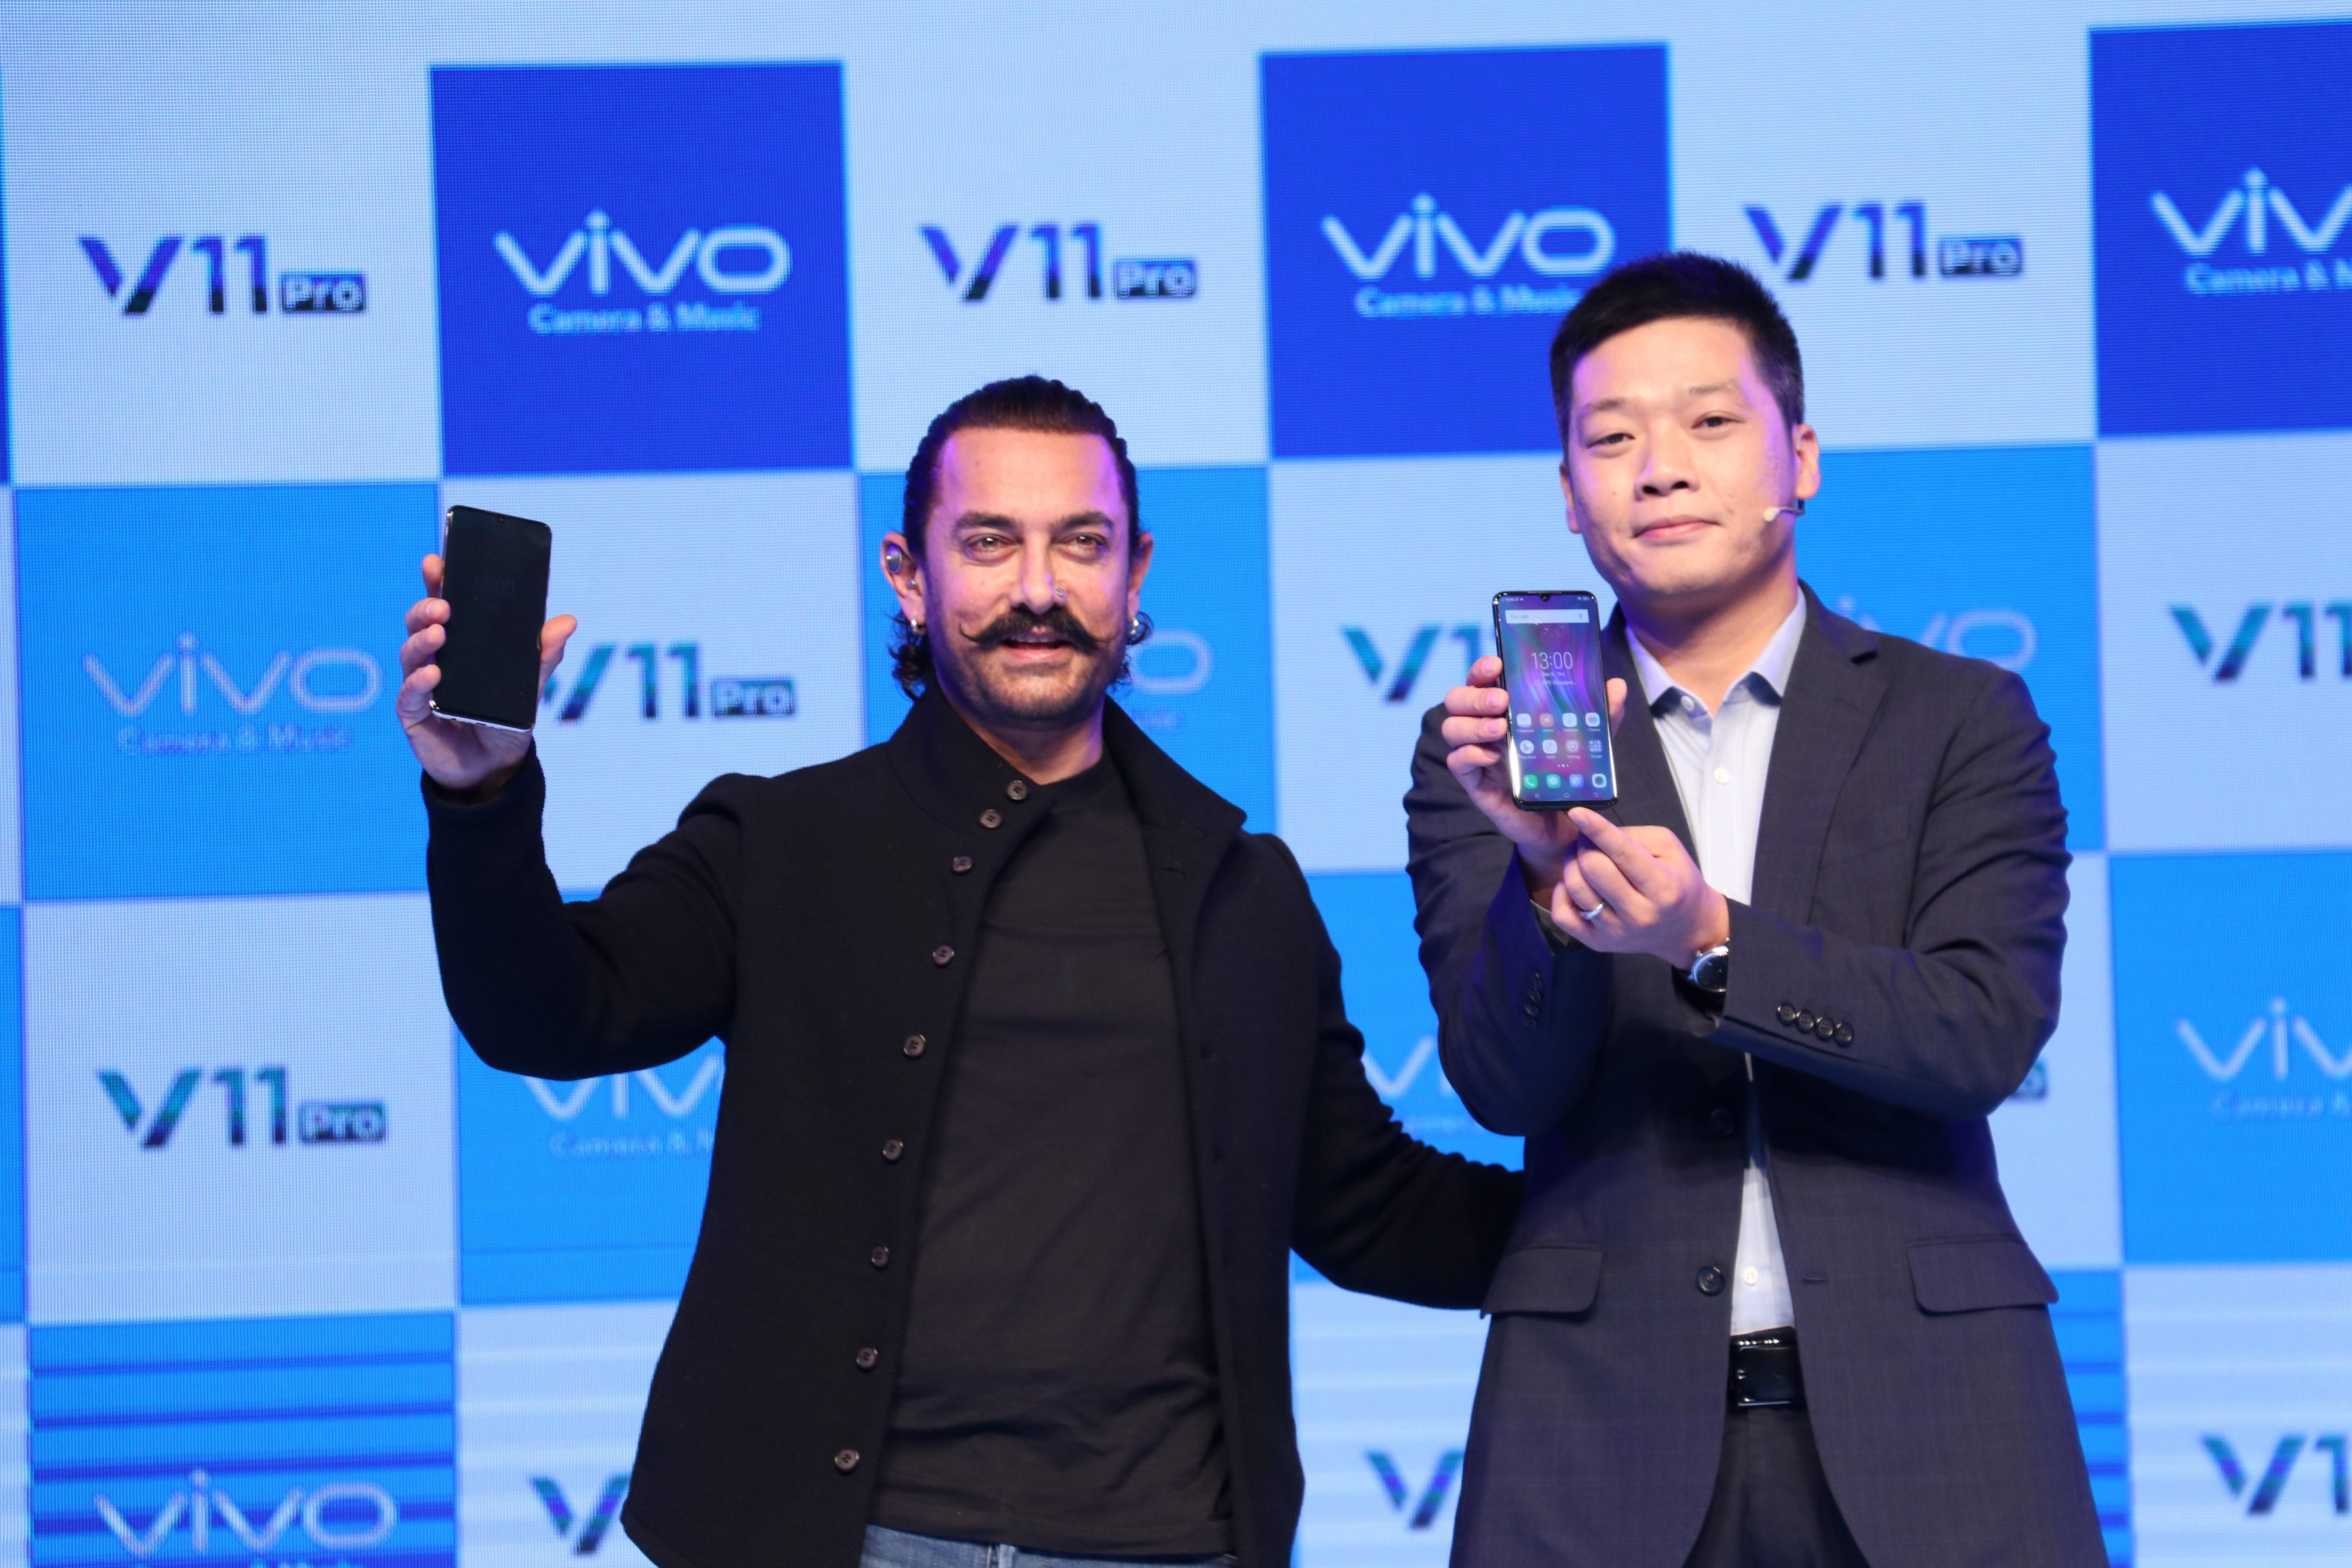 R - Aamir Khan, Brand Ambassador, Vivo India with Kent Cheng, CEO, Vivo India at the launch of Vivo V11 Pro in Mumbai today